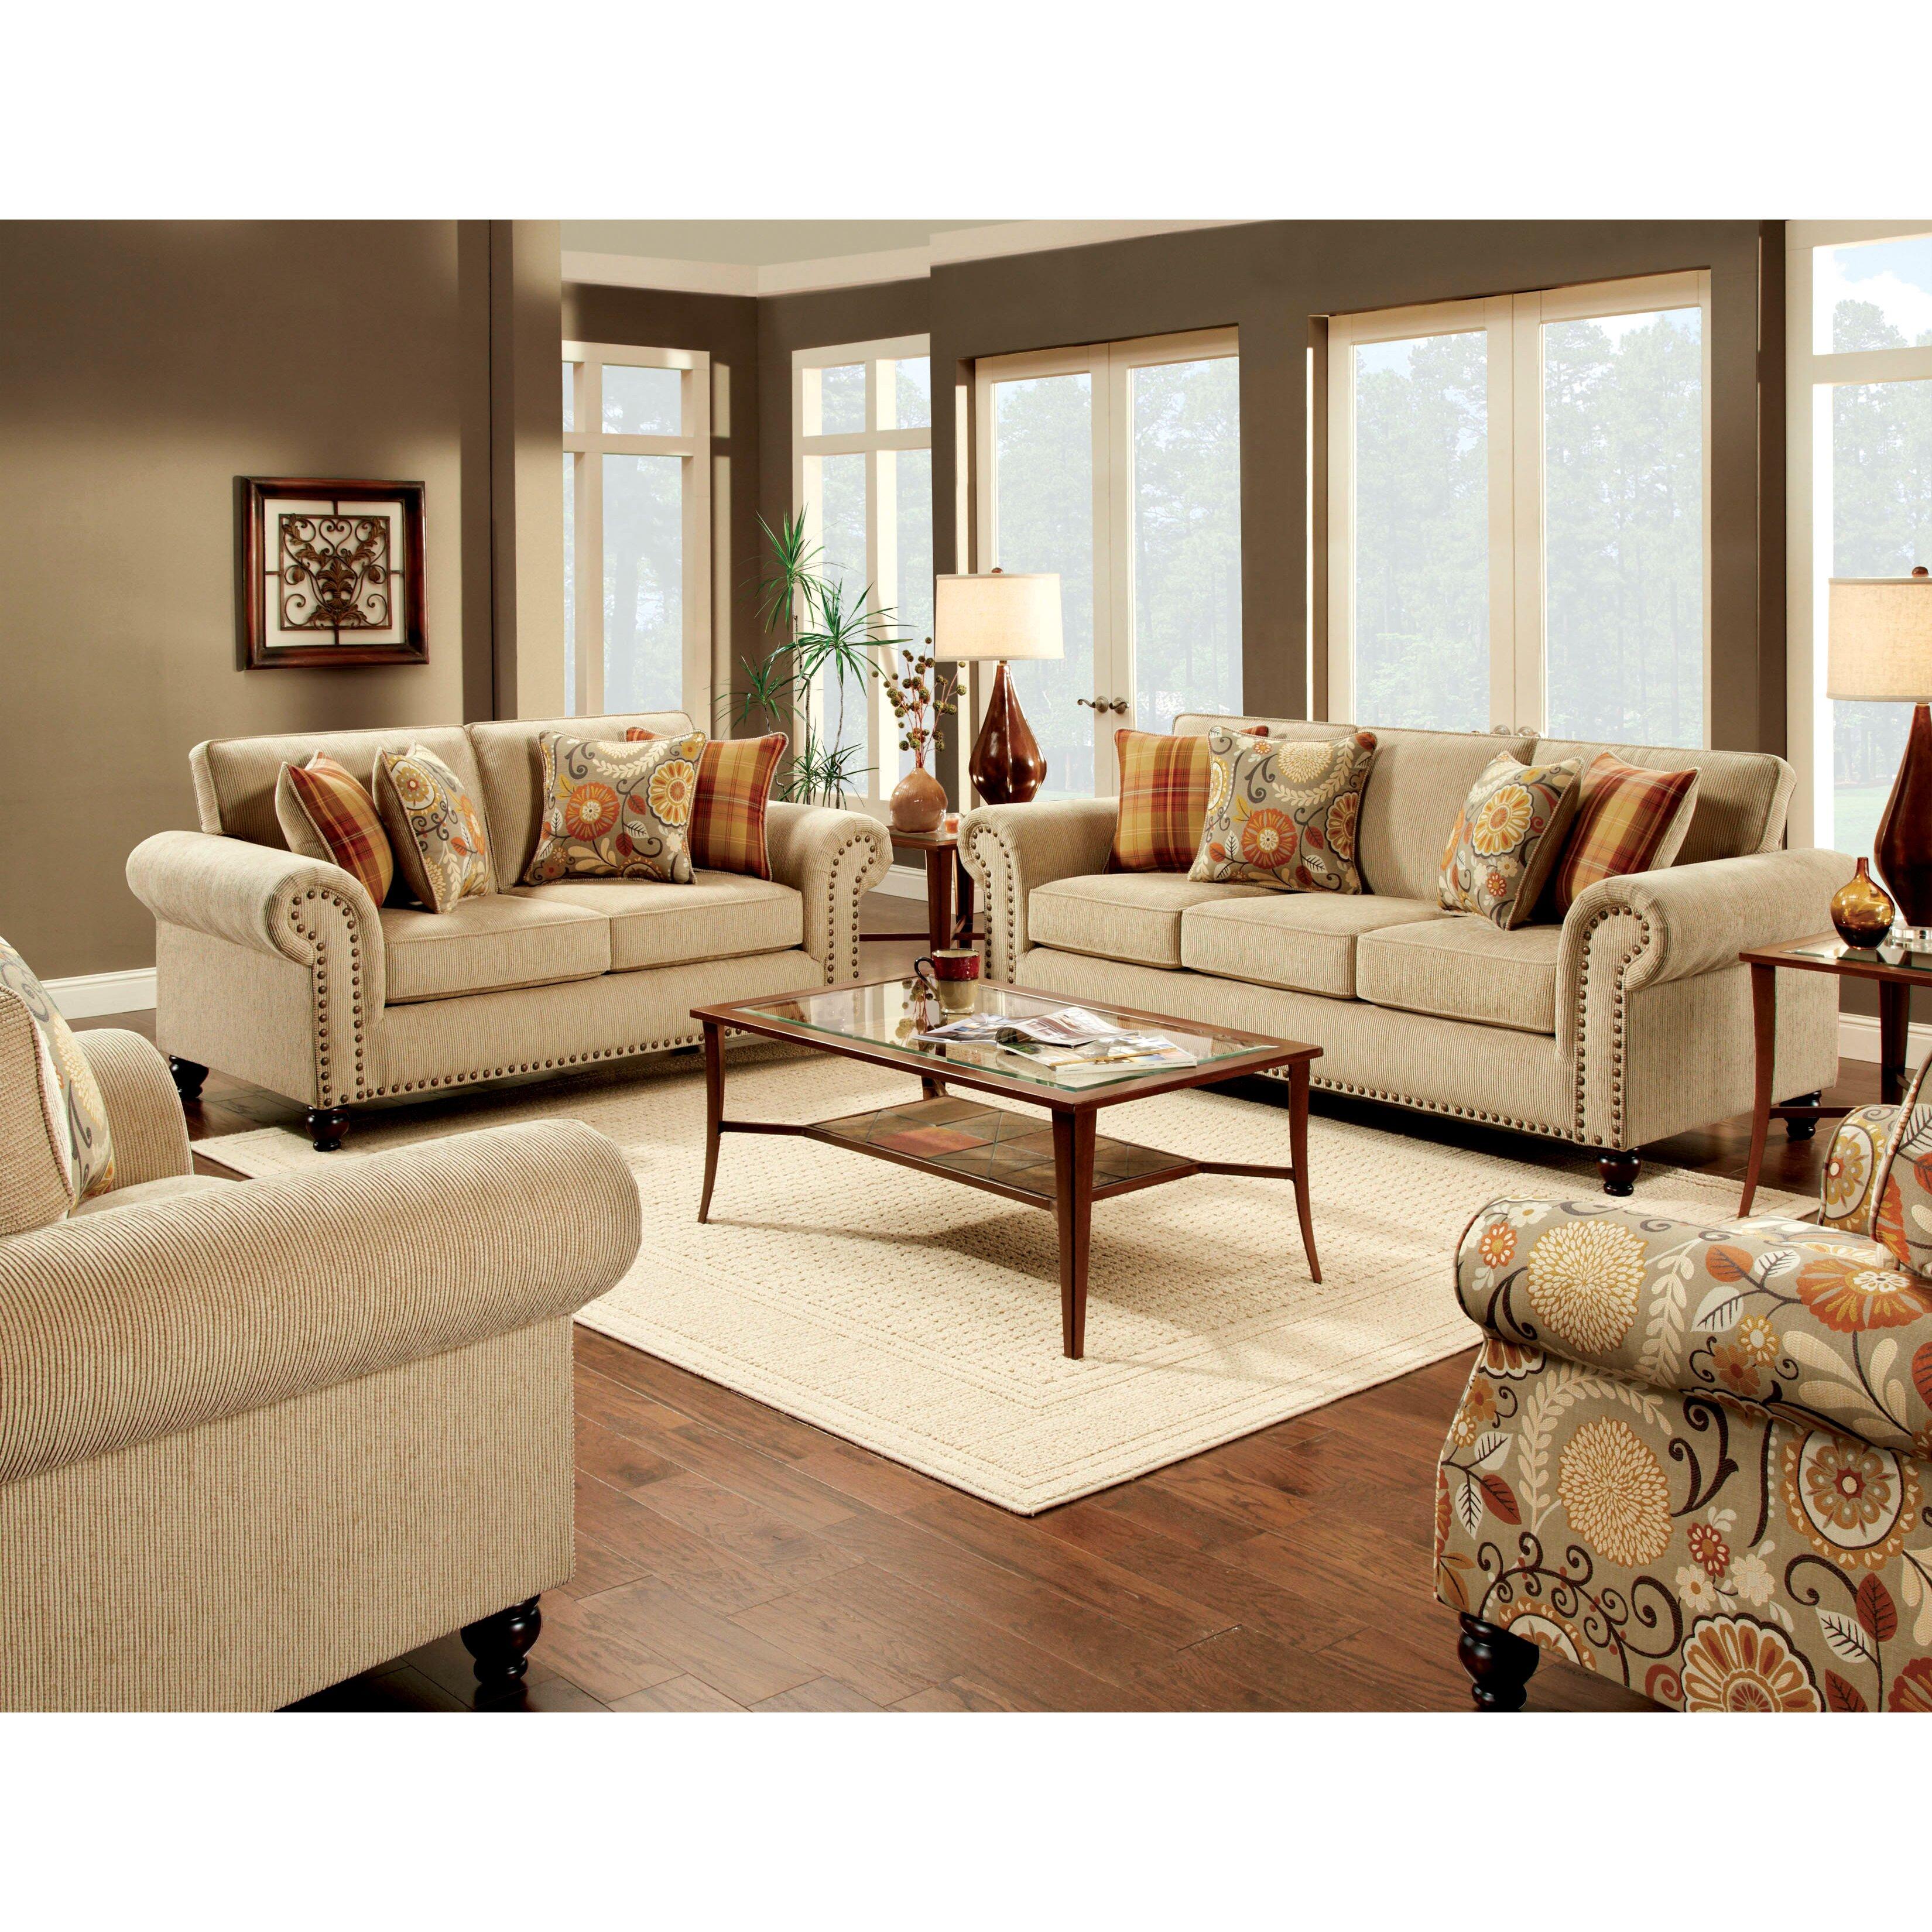 Hokku designs primavera living room collection reviews for Hokku designs living room furniture